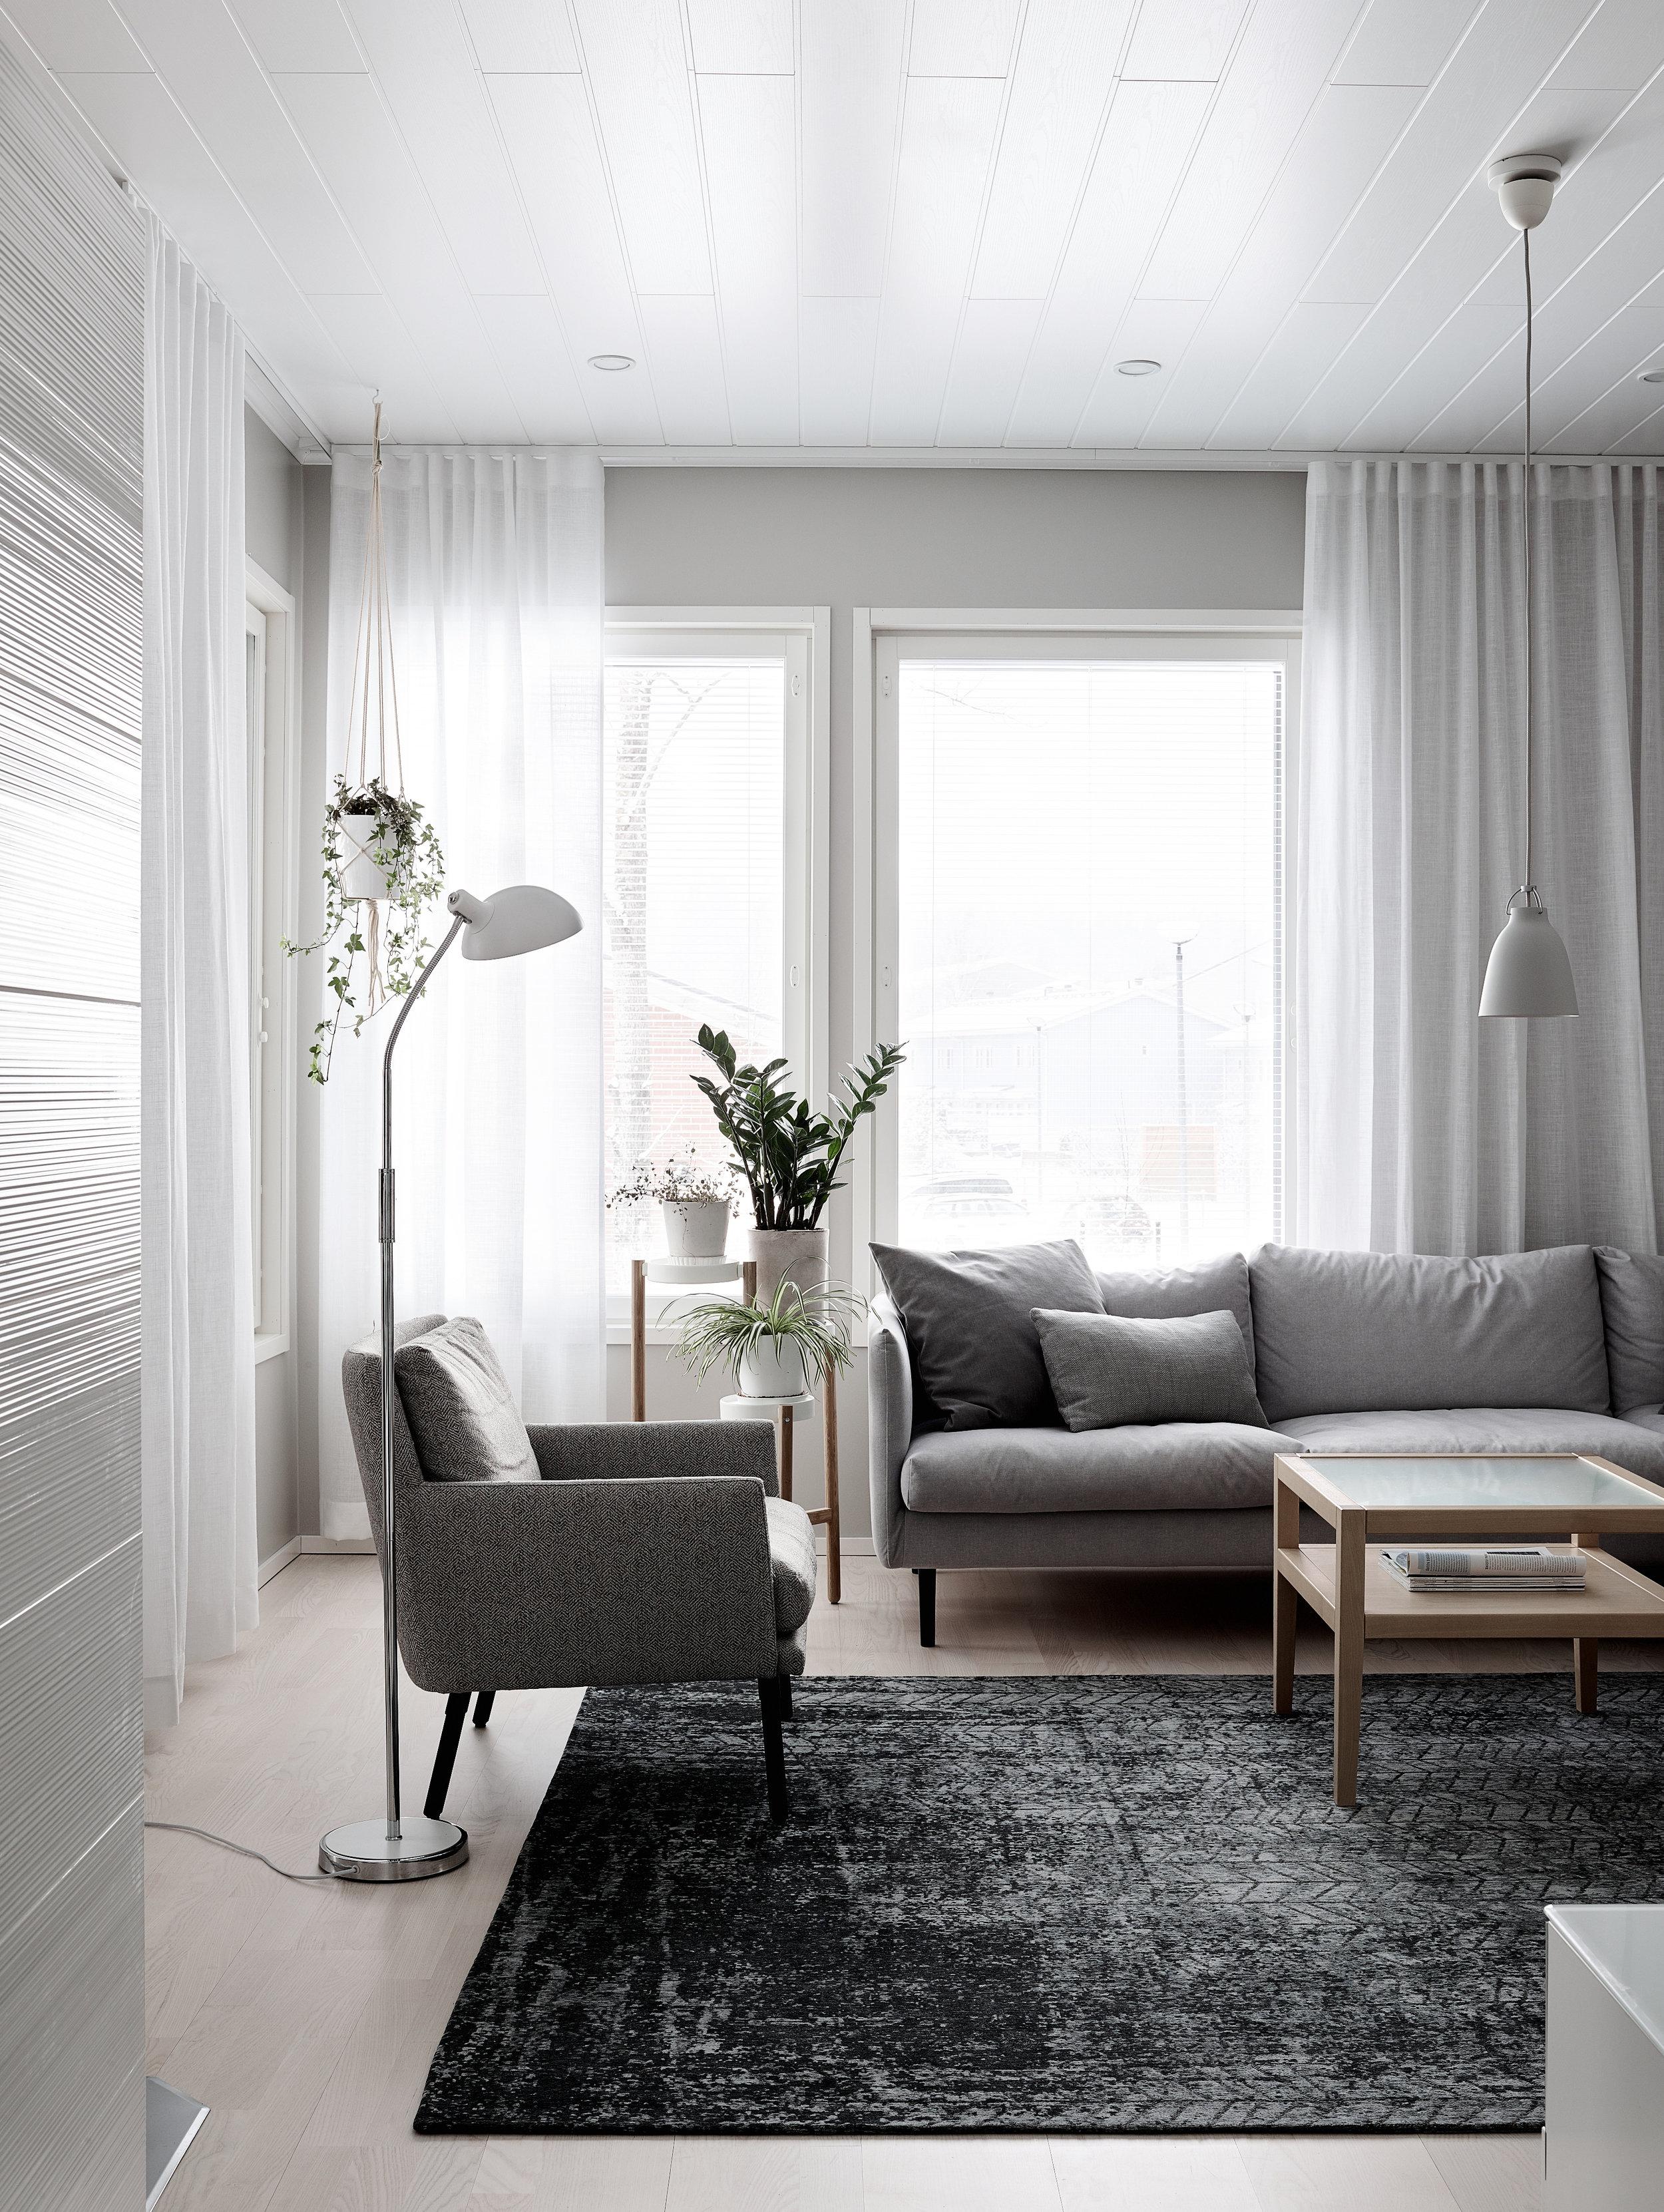 interior-anna-koponen-photo-krista-keltanen-02.jpg